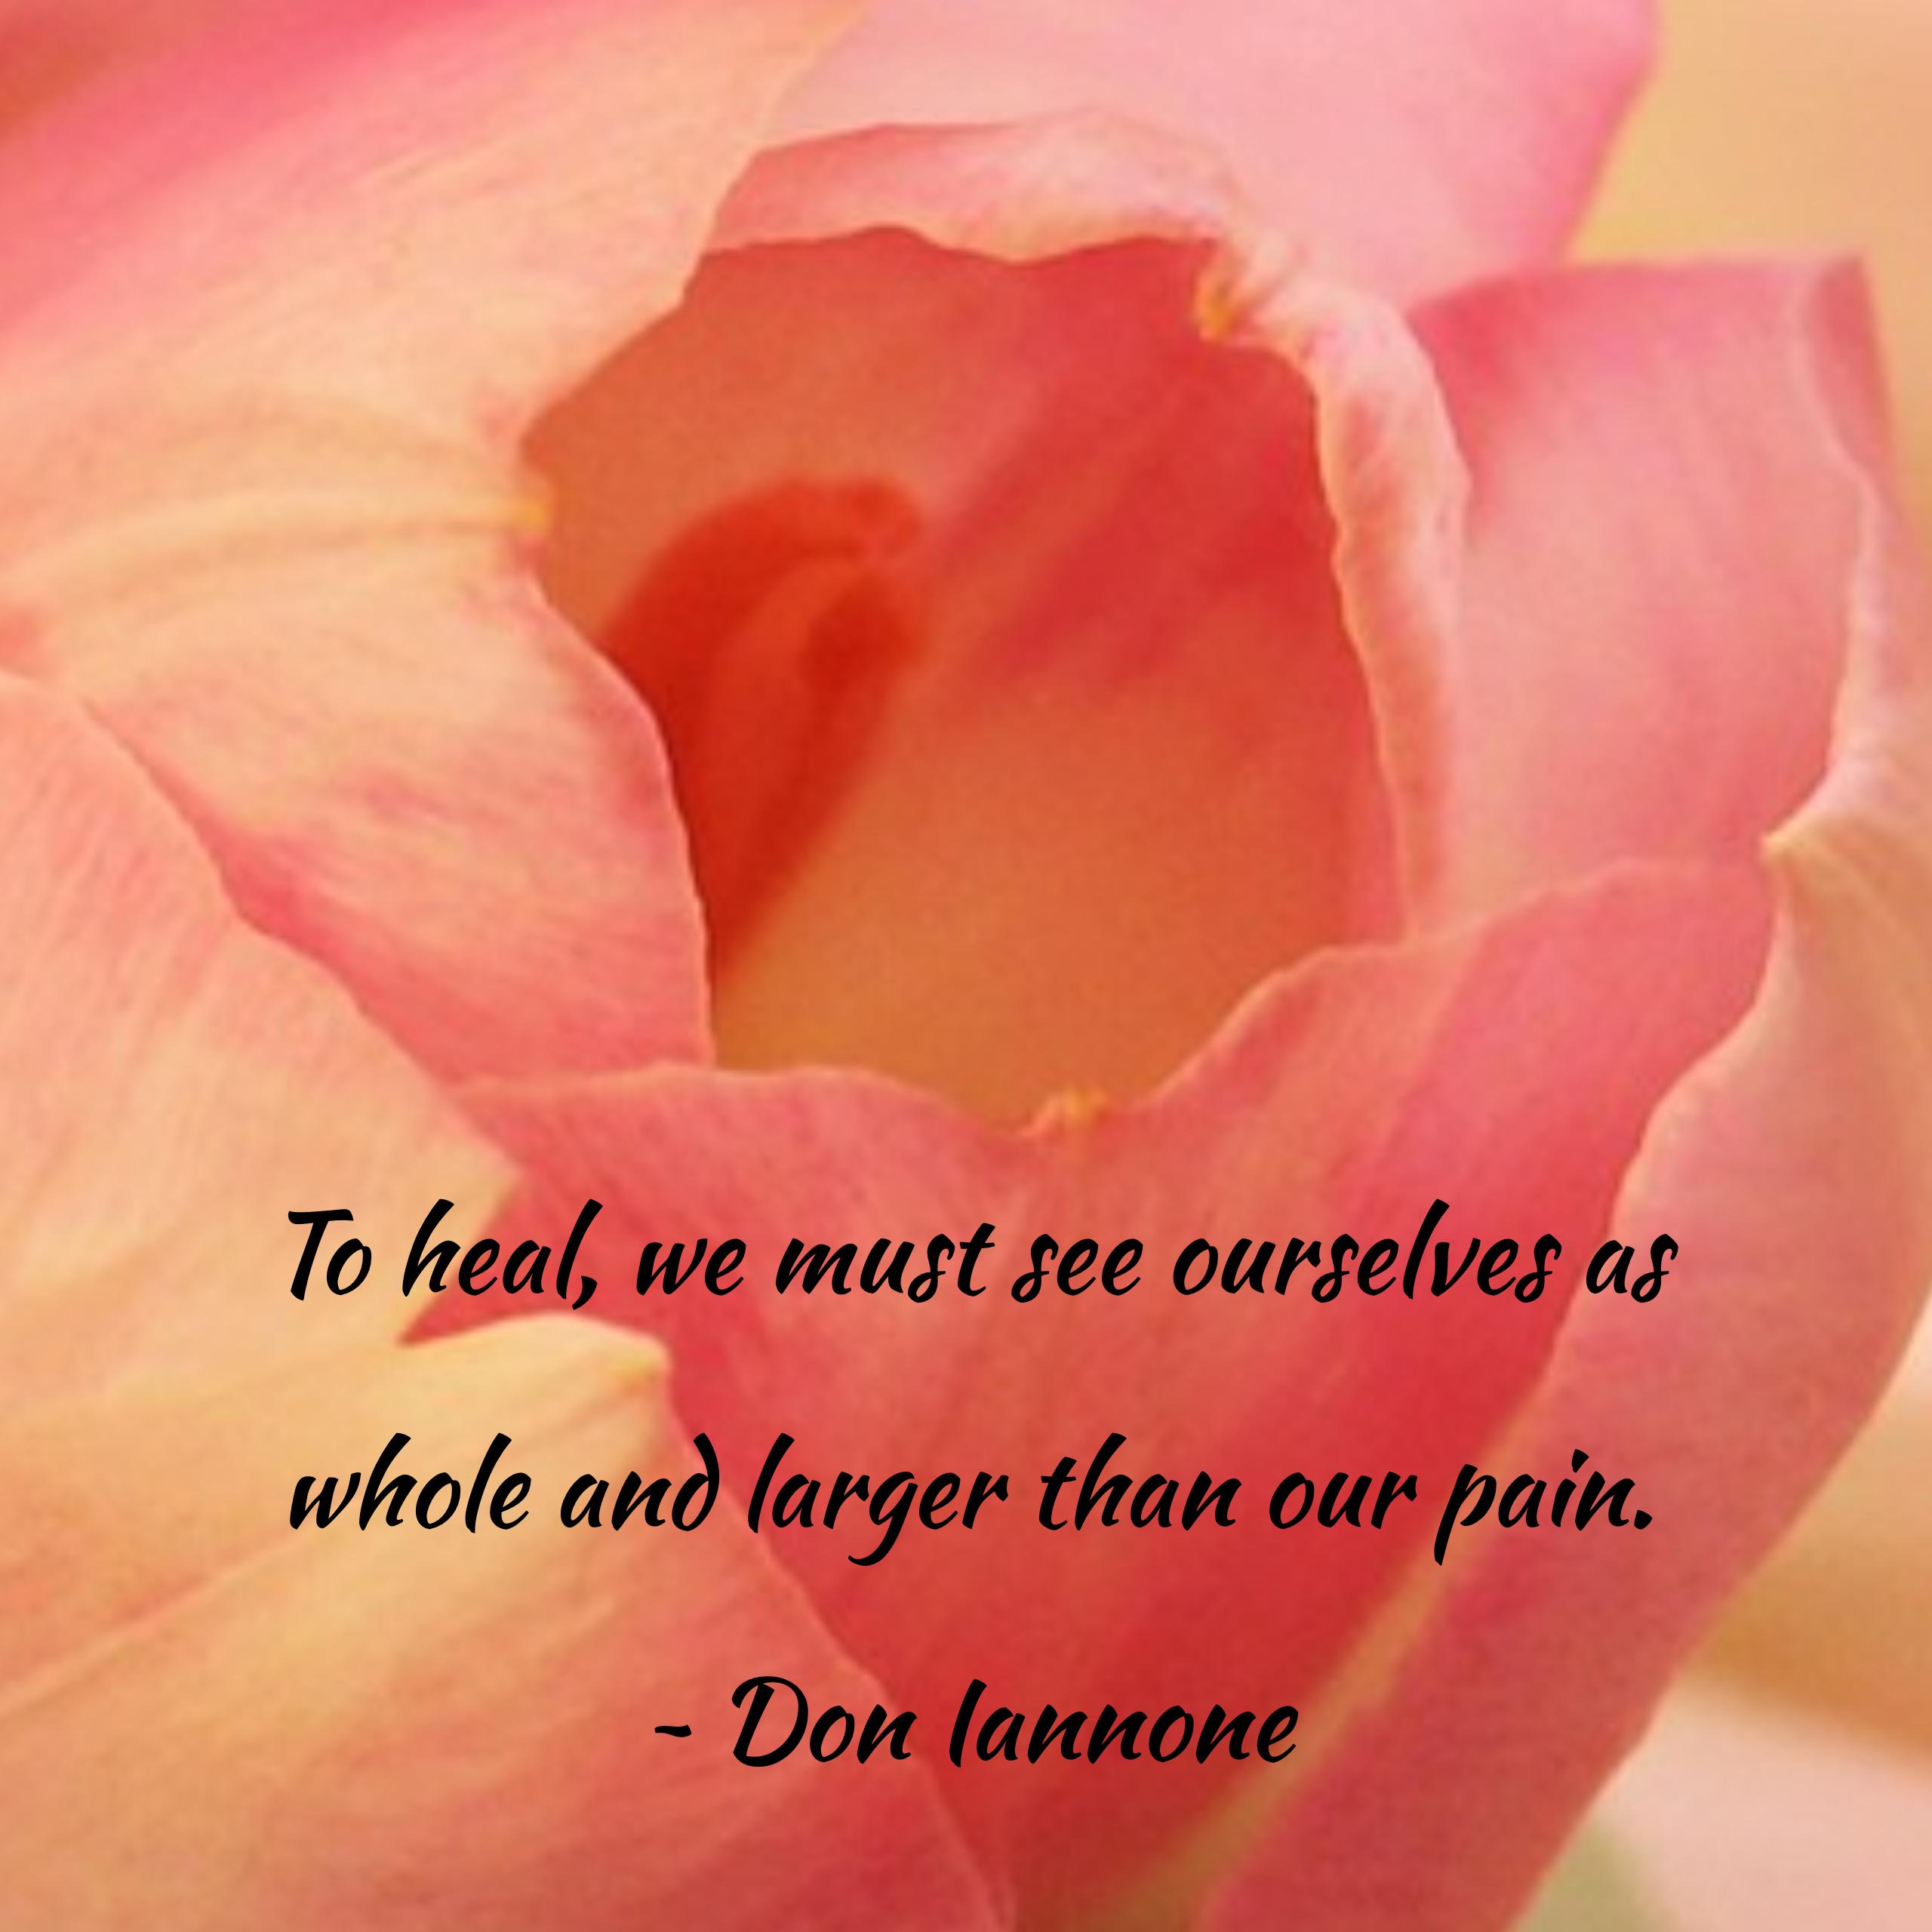 heal whole